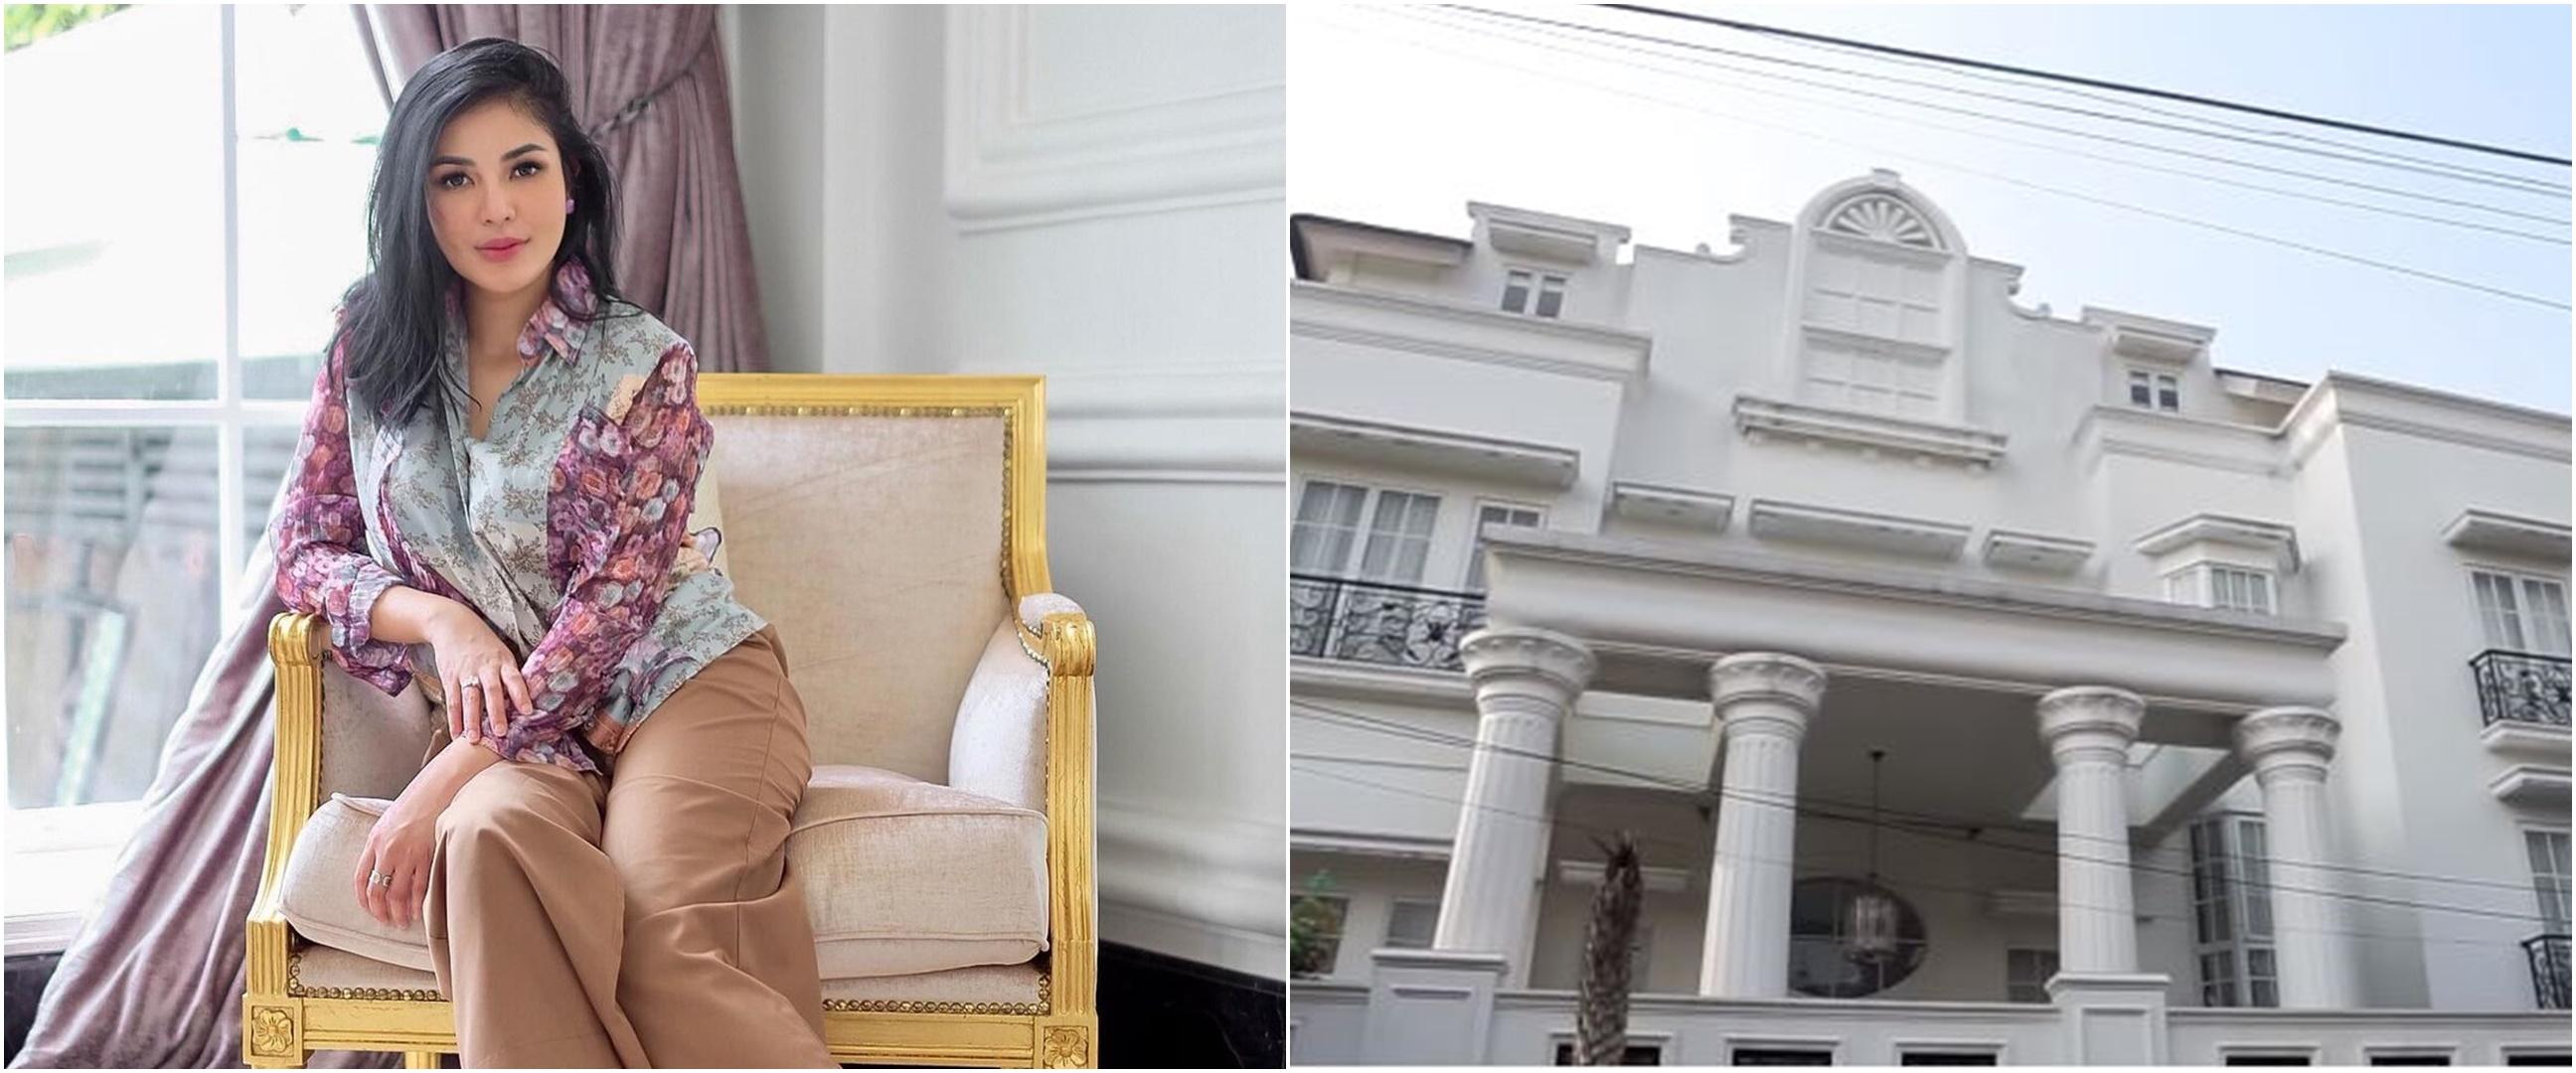 10 Potret rumah mewah Nindy Ayunda, ada ruang salon pribadi